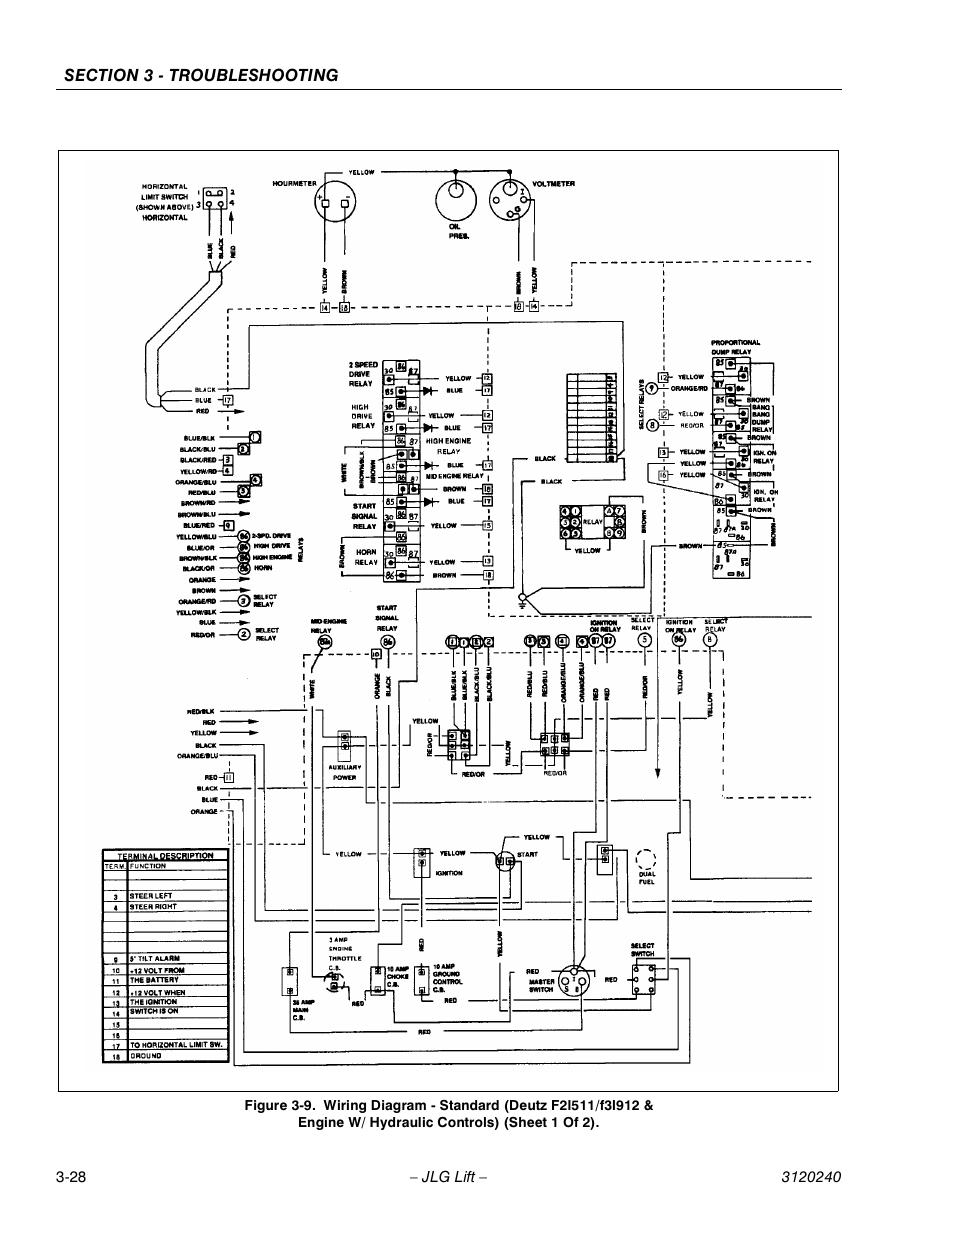 Jlg 40h Service Manual User Manual